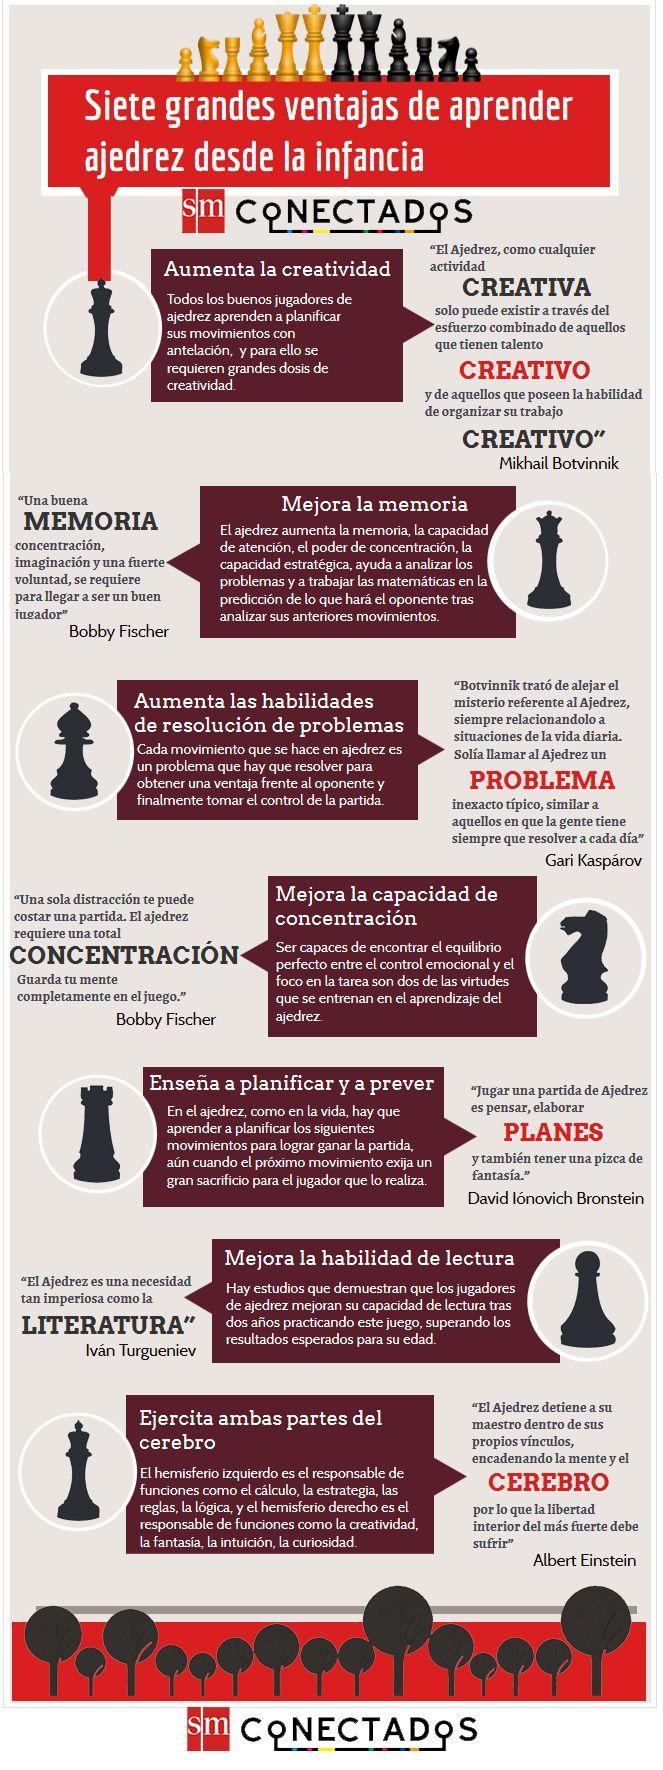 7 grandes ventajas de aprender ajedrez desde la infancia #infografia #education